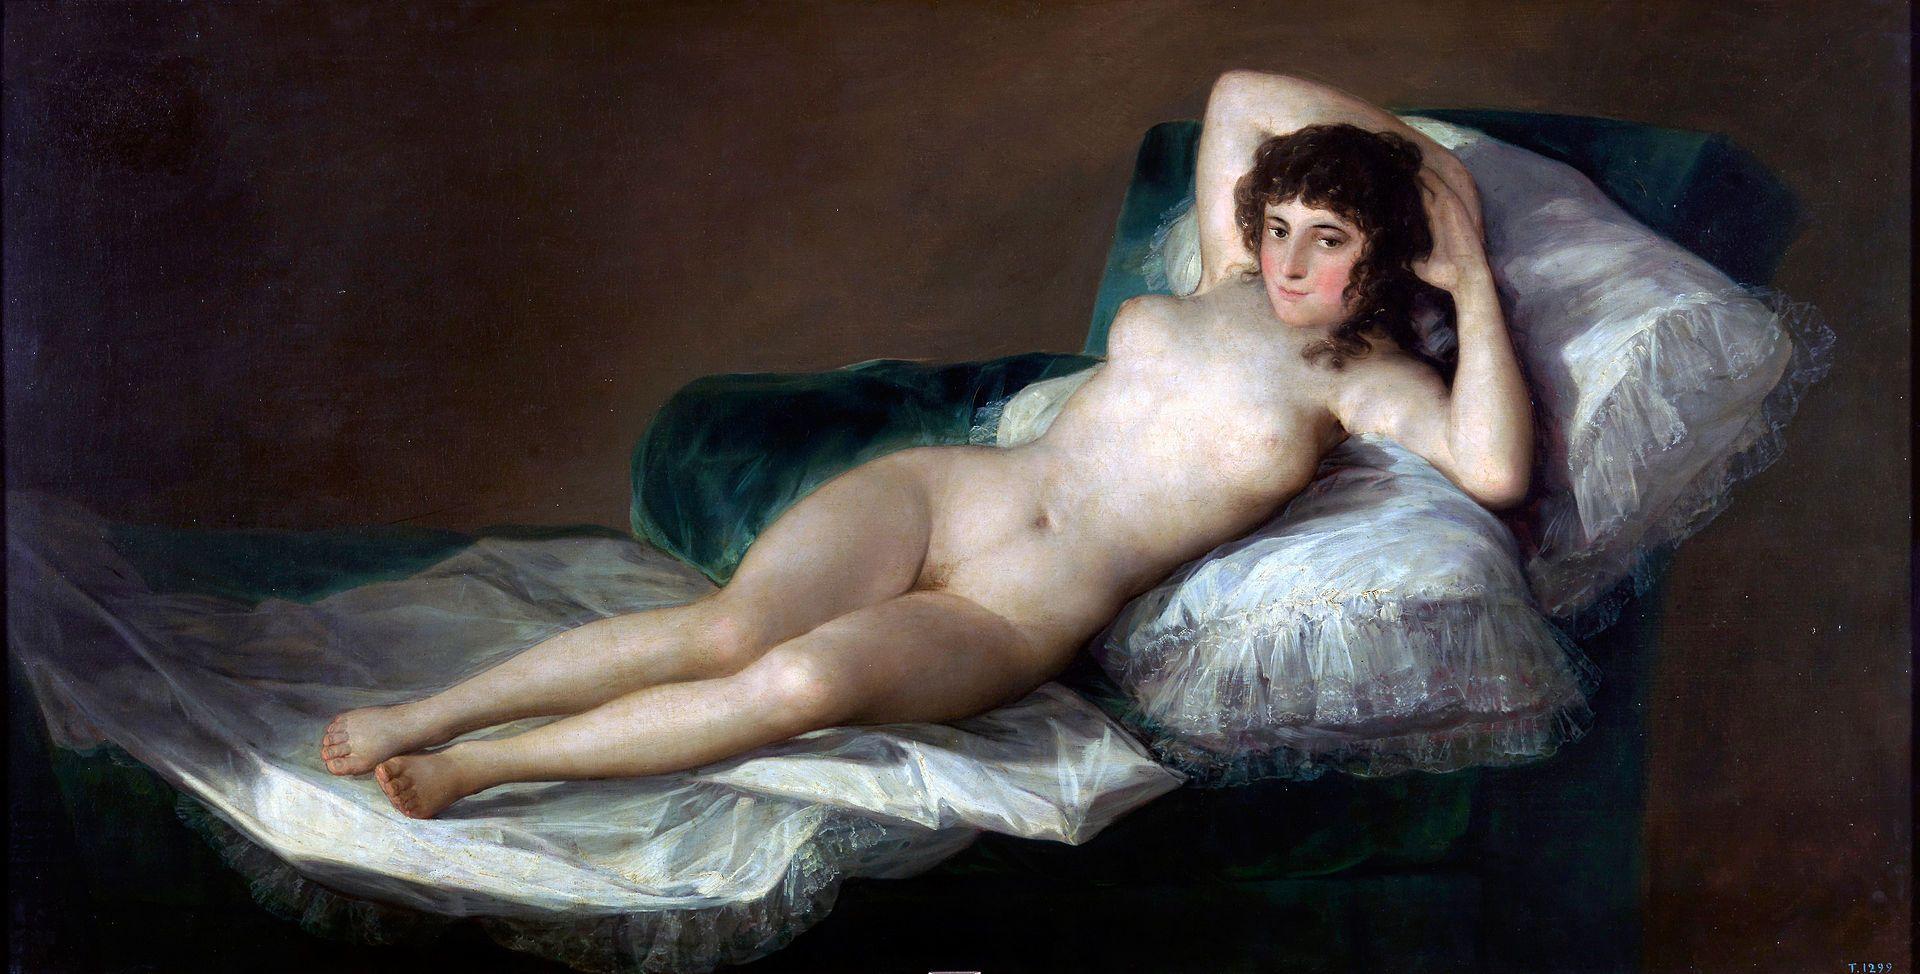 visite musée du prado - Maja nue - Goya